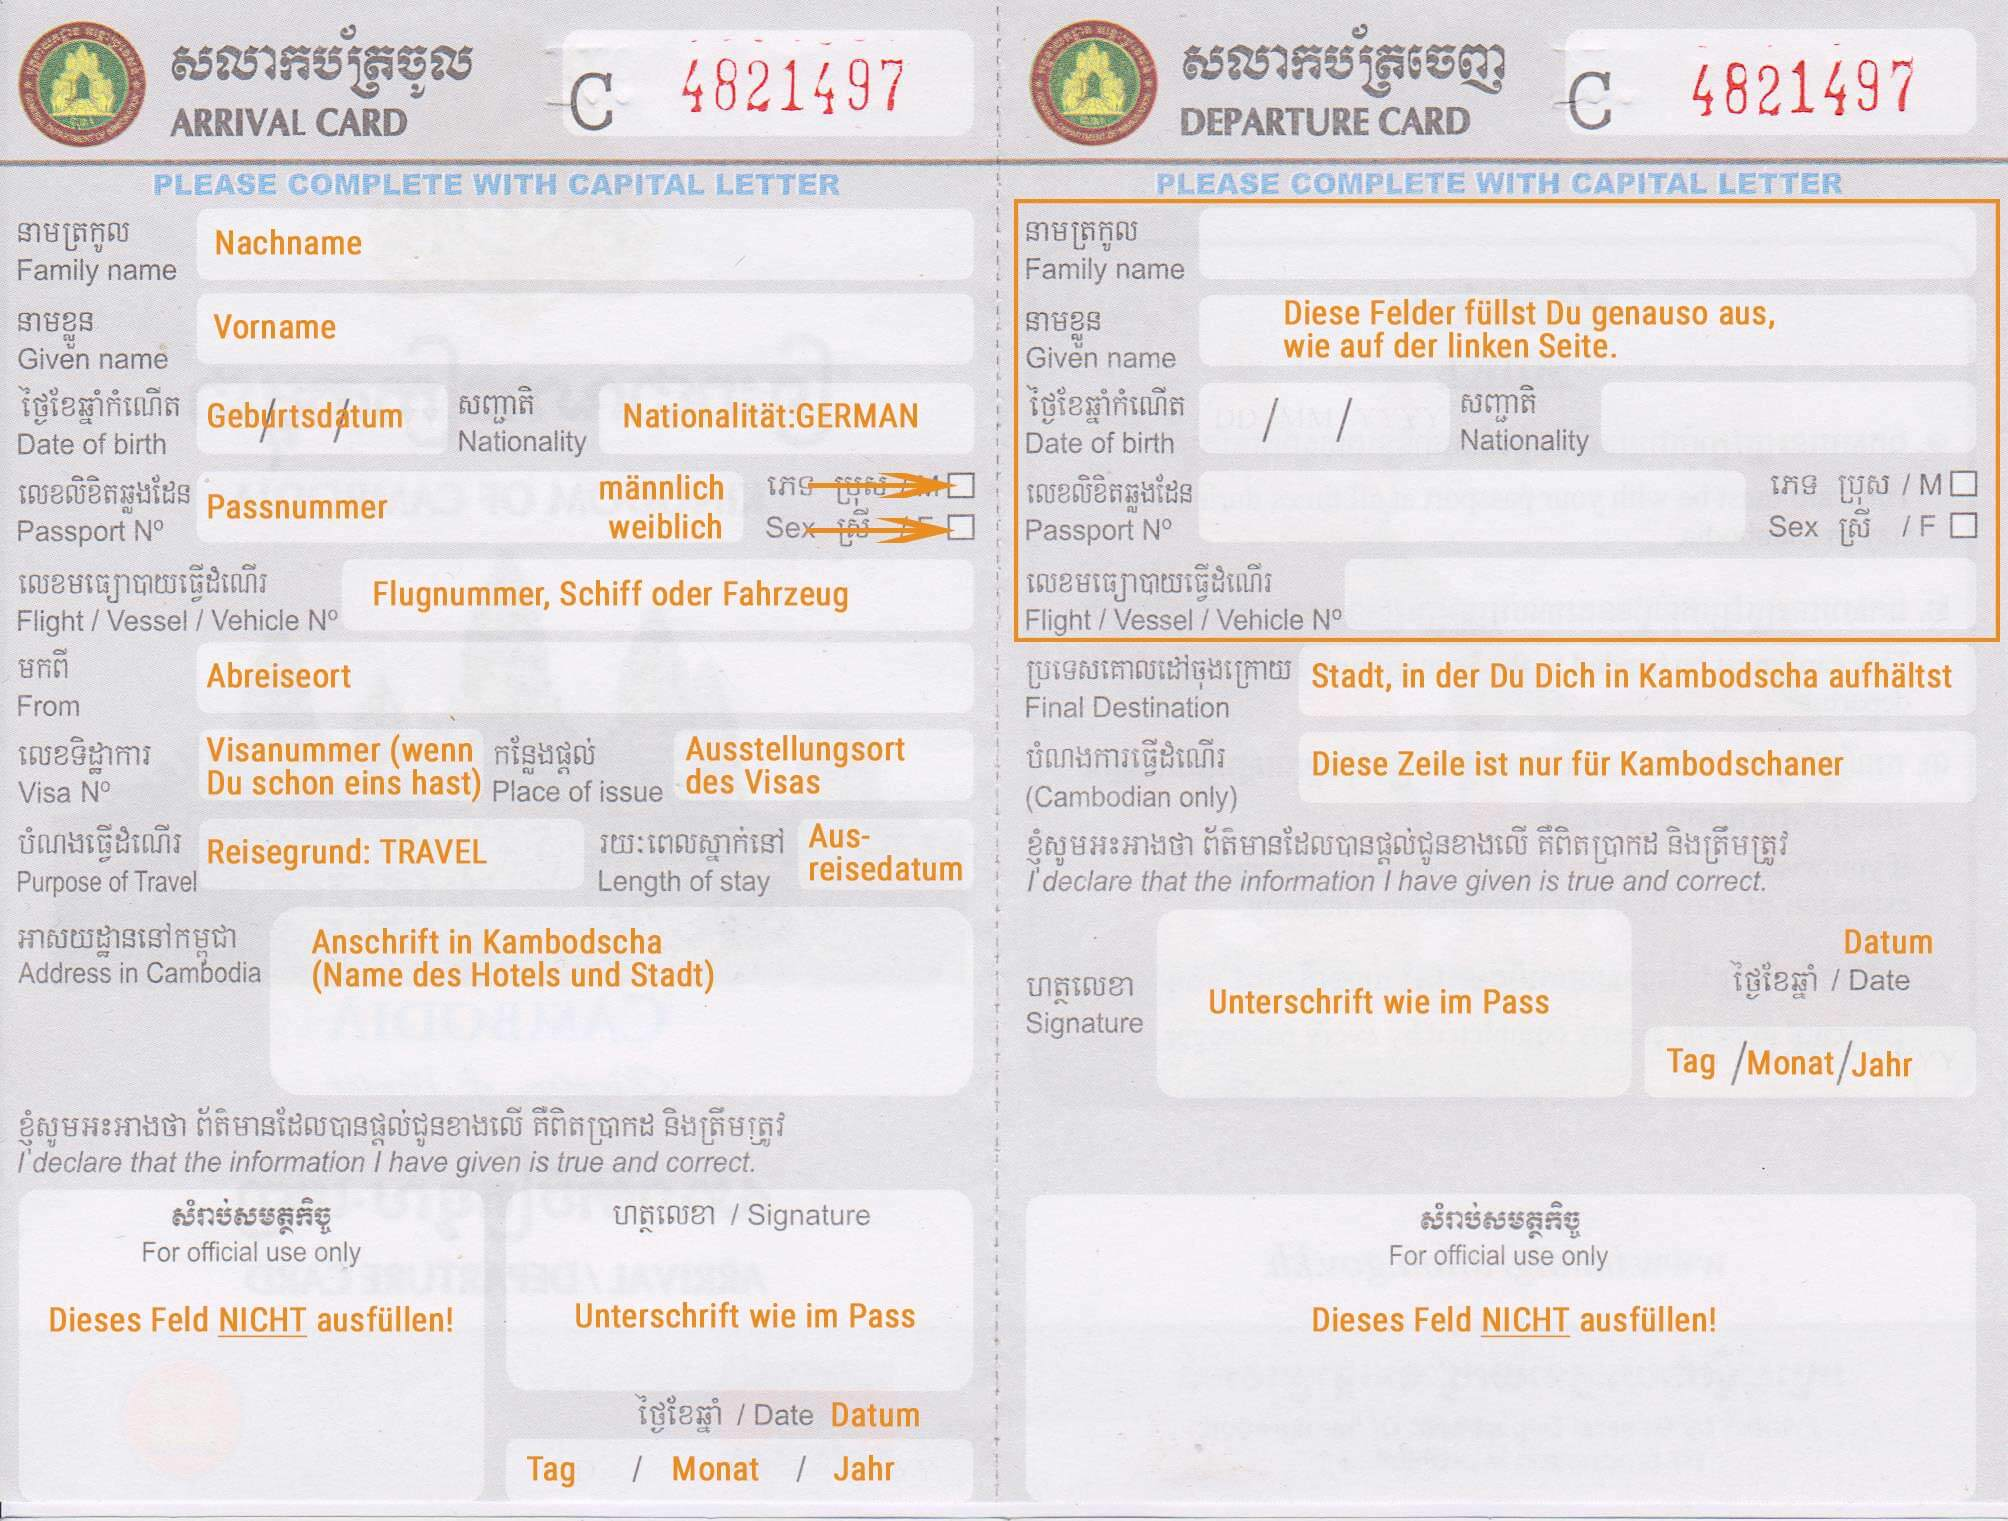 Arrival und Departure Card, Kambodscha